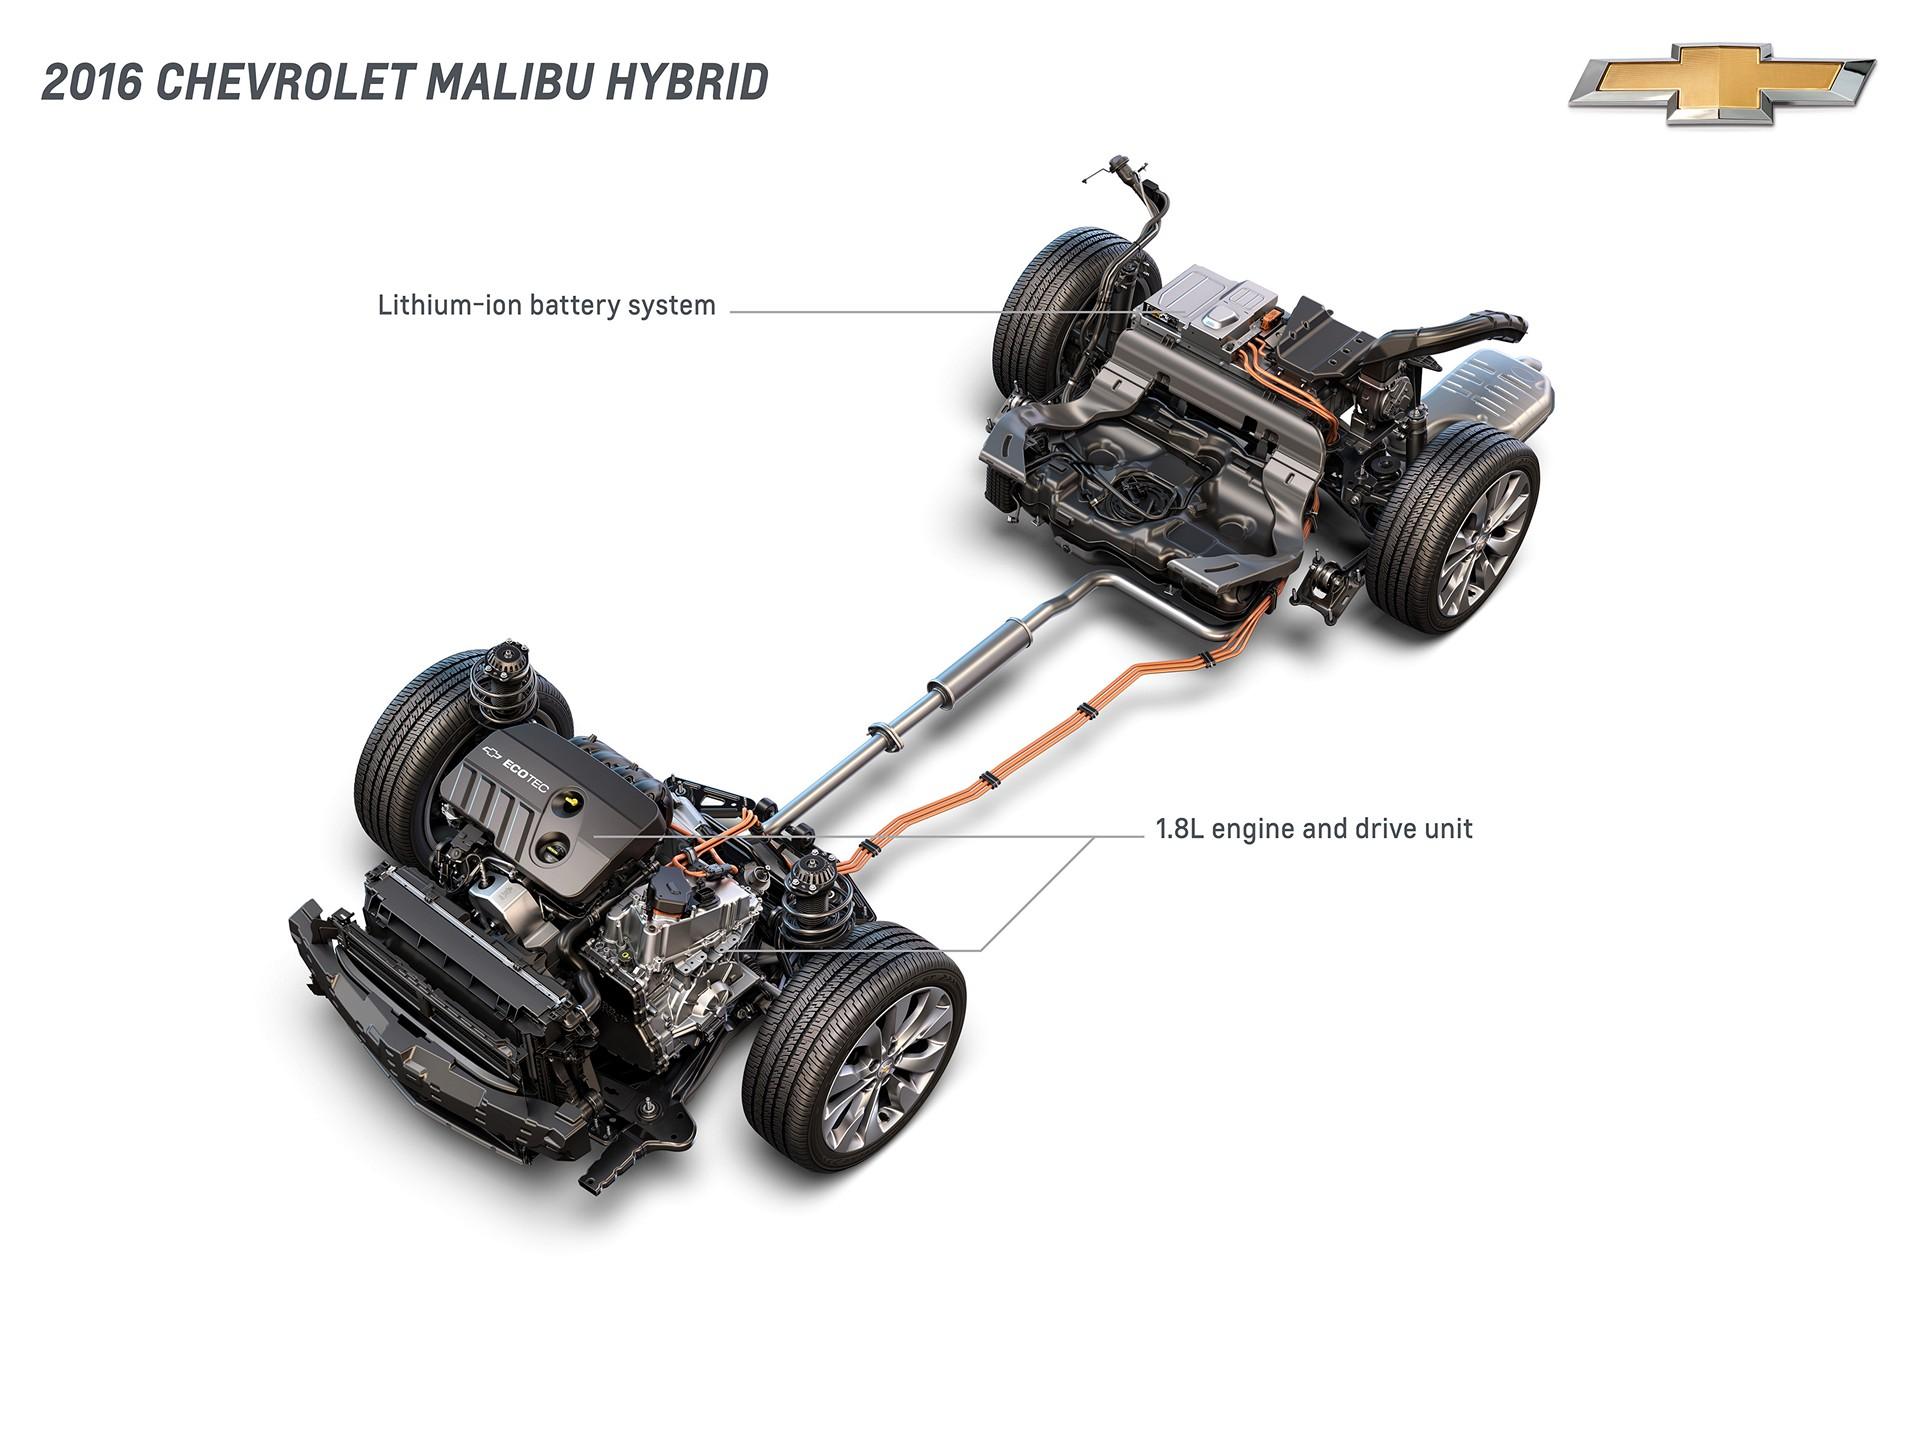 2016 Chevrolet Malibu Hybrid Lithium-Ion Battery System, 1.8L Engine and Drive Unit © General Motors